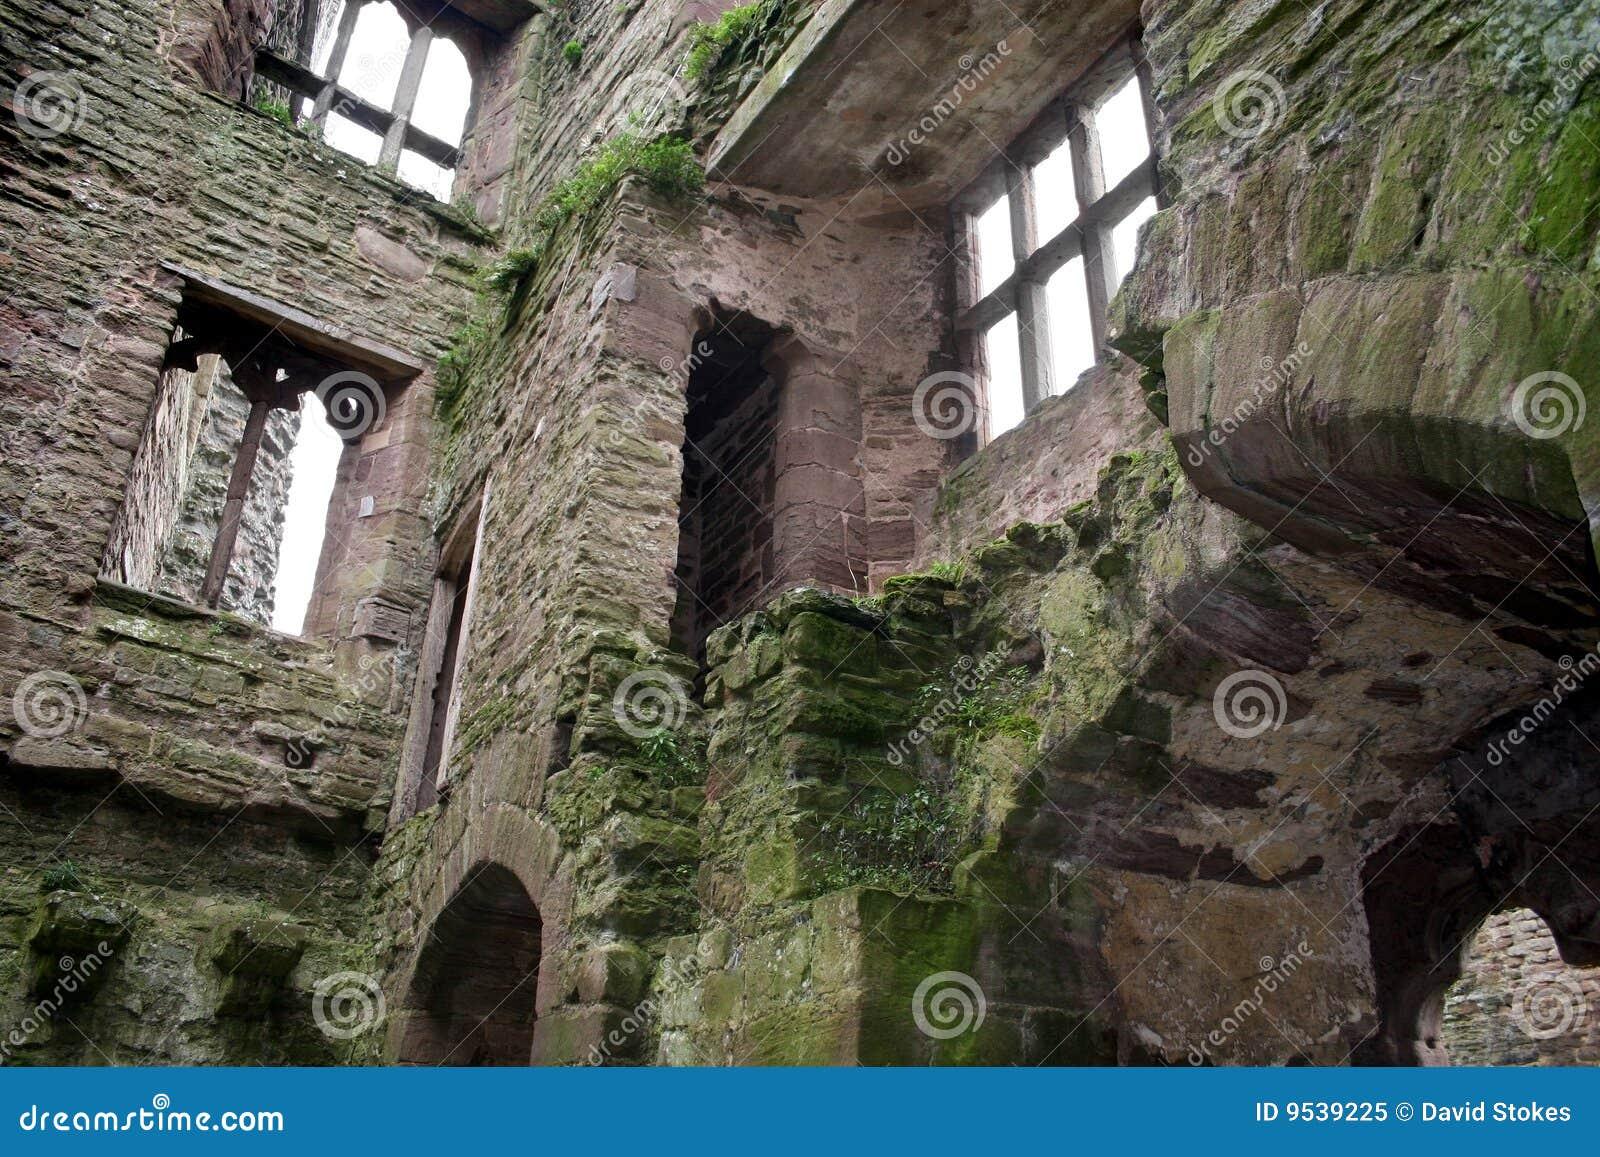 ludlow castle interior